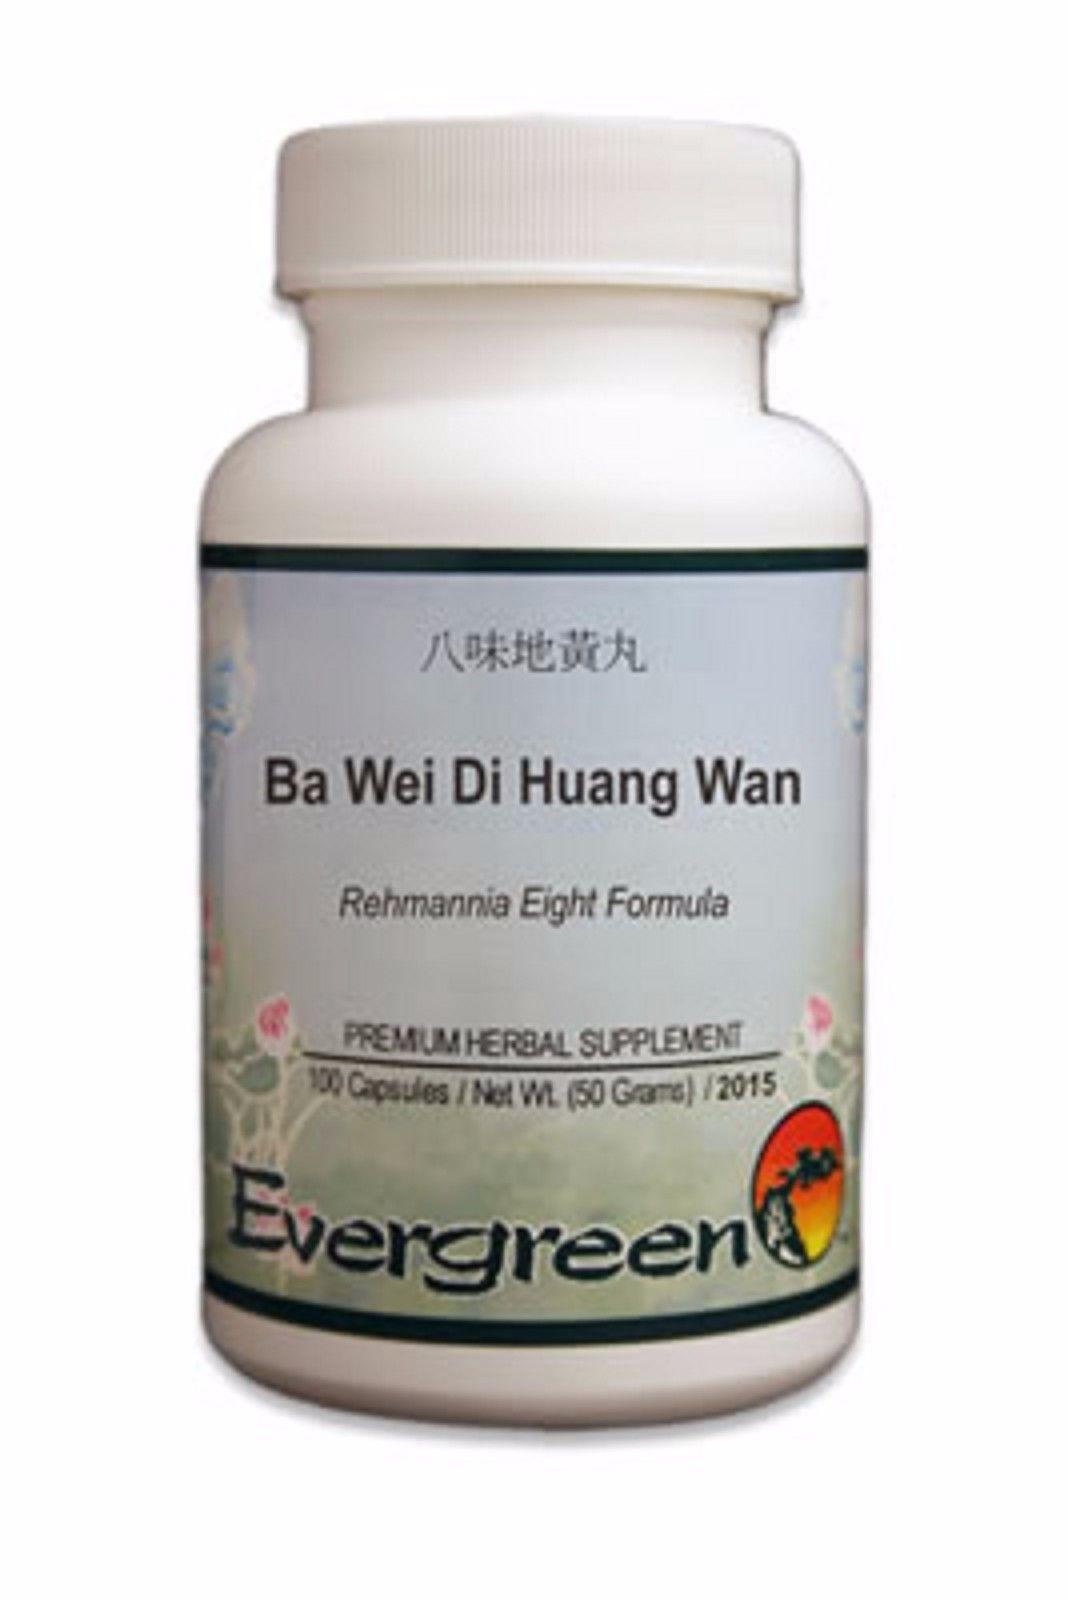 BAI WEI DI HUANG WAN 100caps   Alternative Medicine and ...